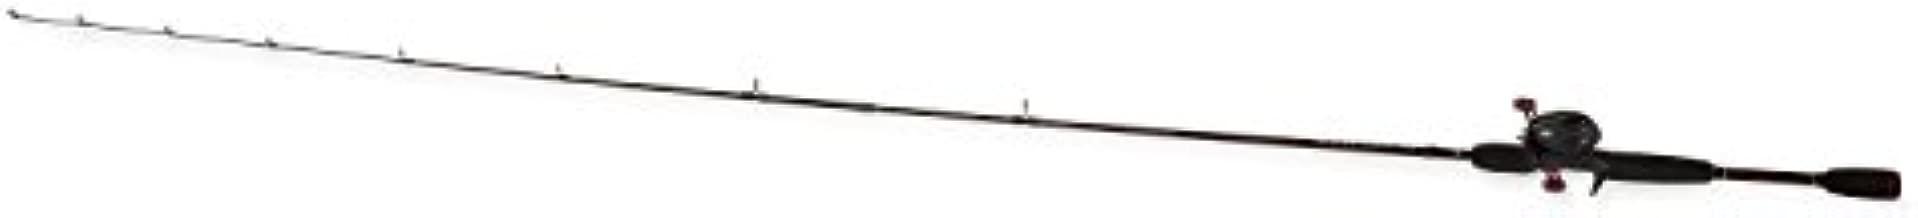 Abu Garcia BMAX3/701MH Black Max Fishing Rod and Baitcast Fishing Reel Combo, 7 Feet, Medium Heavy Power